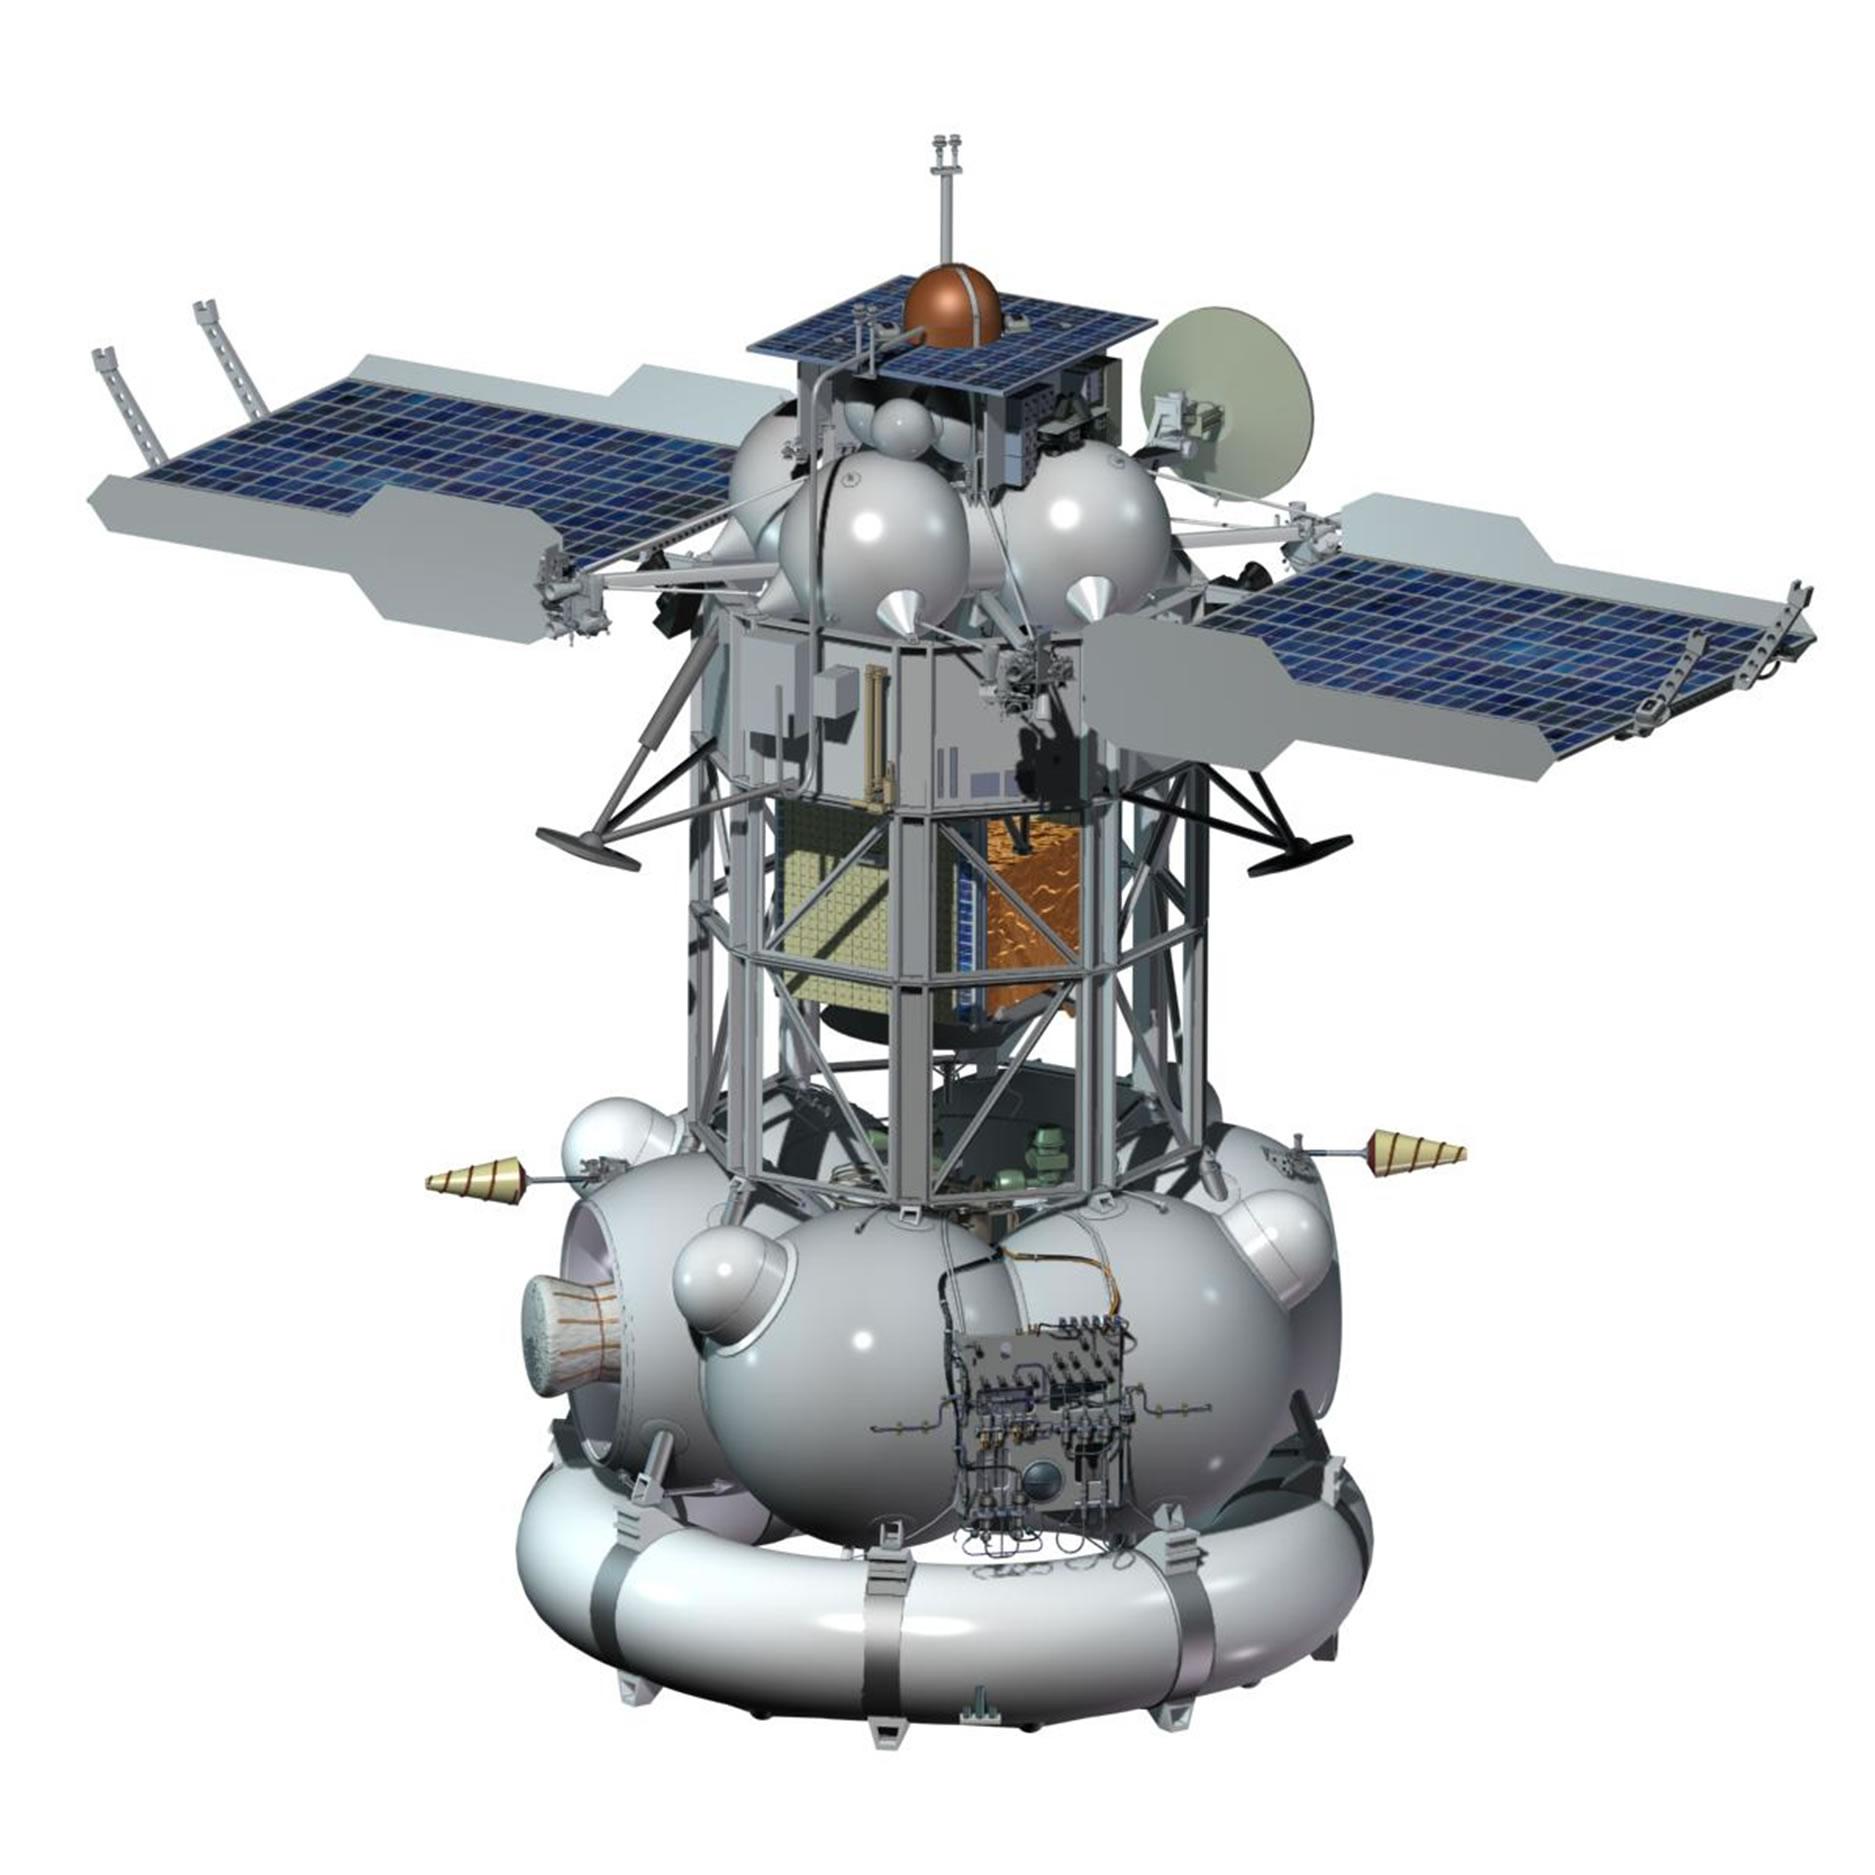 Esa Science Technology Phobos Soil Phobos Grunt Spacecraft Design